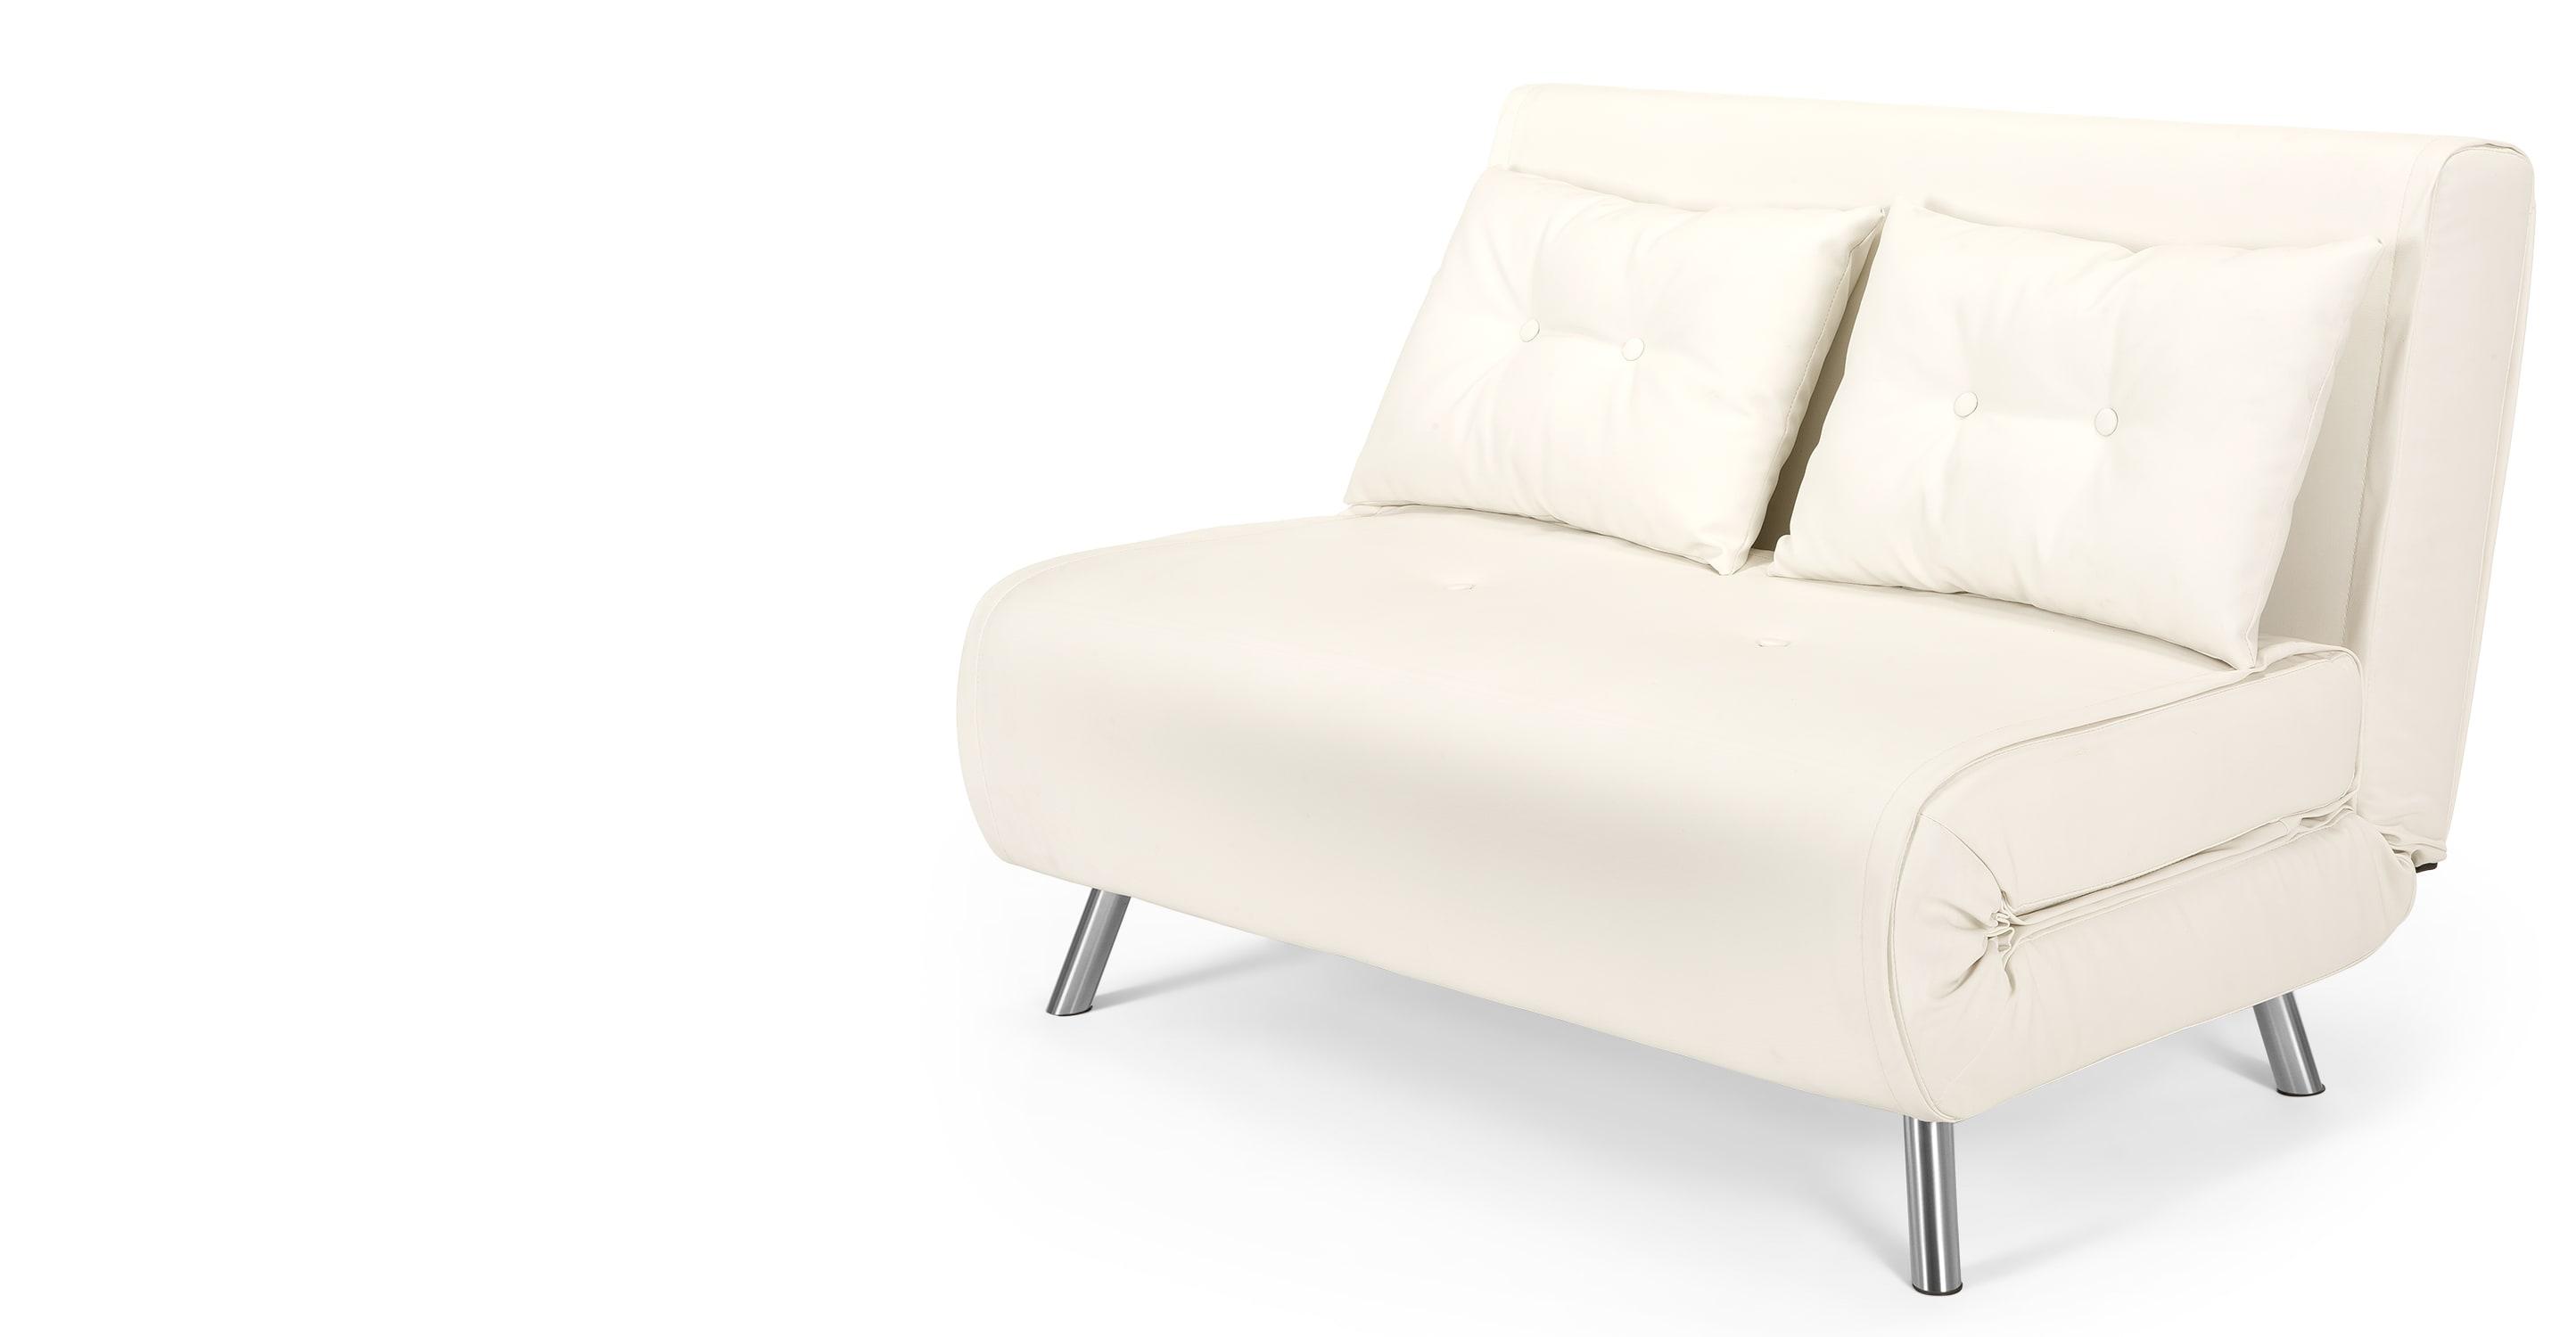 small sofa beds a small sofa bed, in ibis cream ZOTLYRM